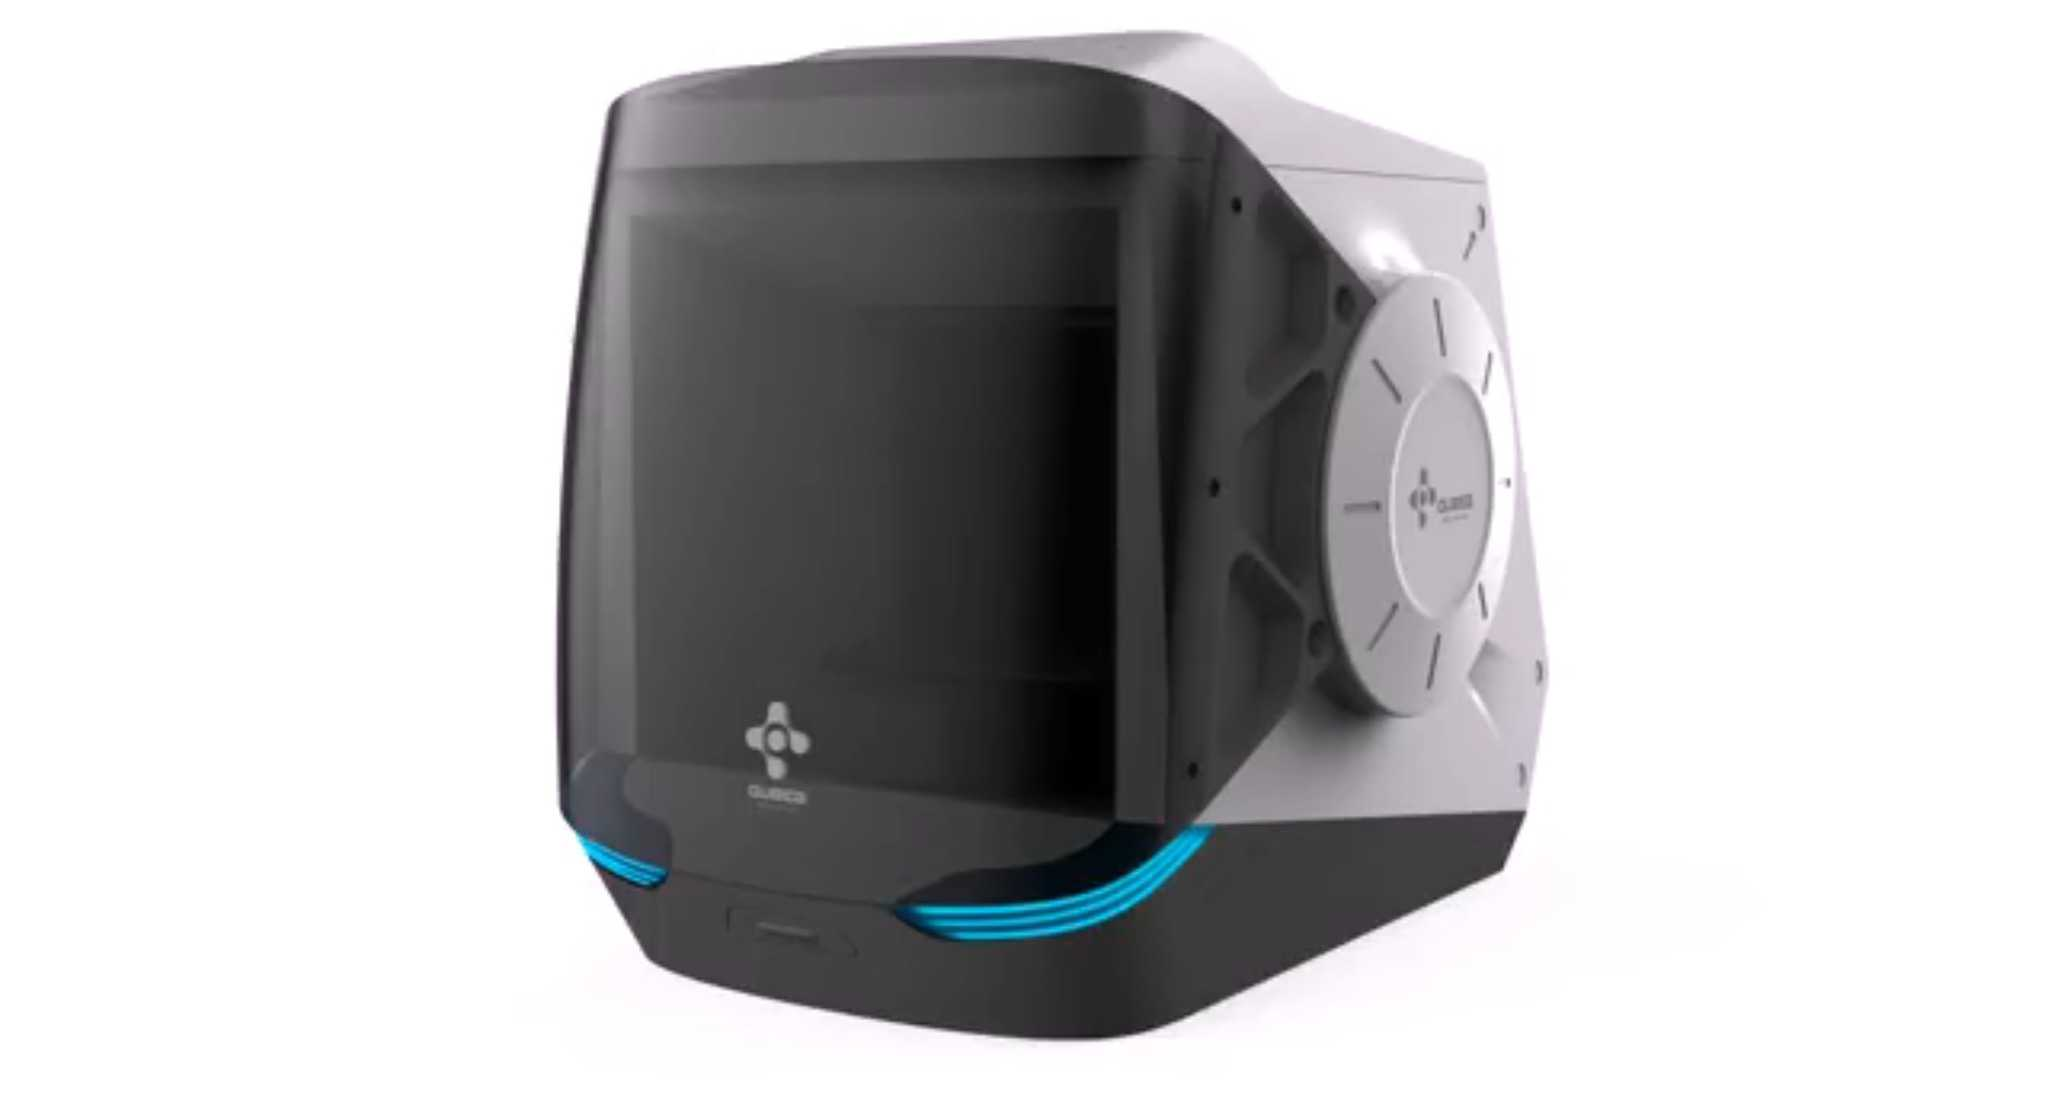 Qubea Rever affordable 3d printer